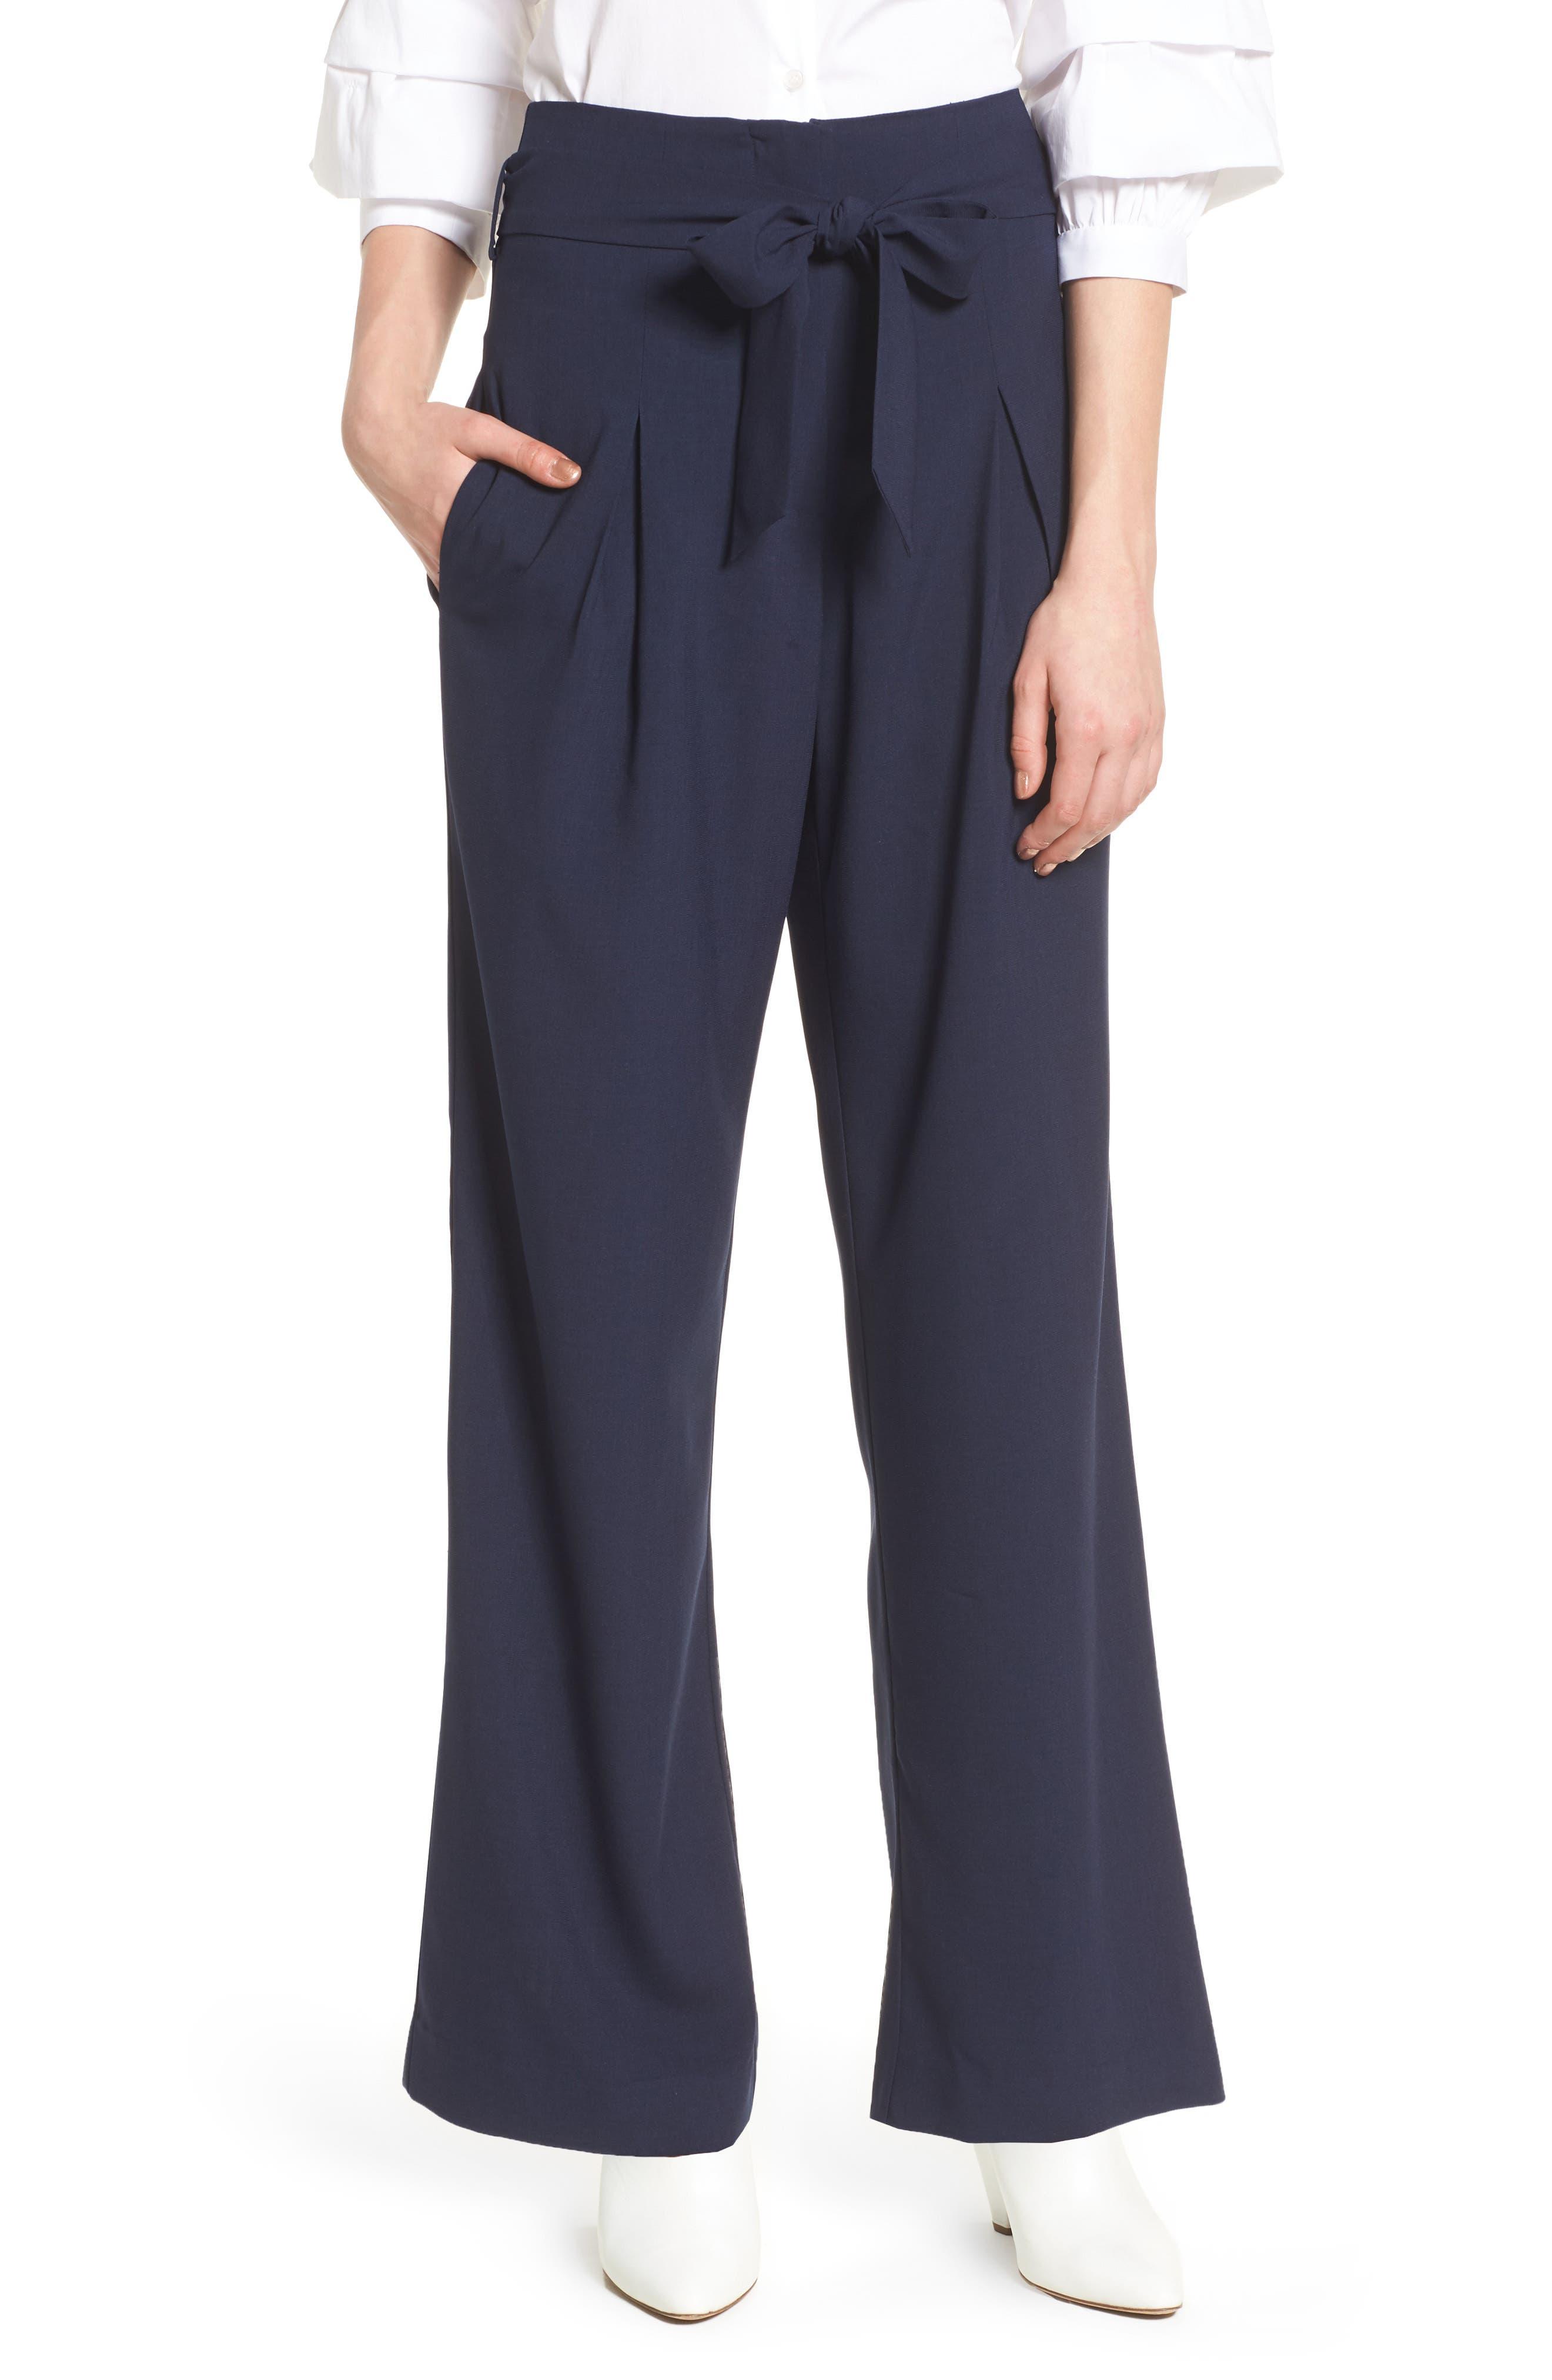 J.O.A. Tie Front Pants